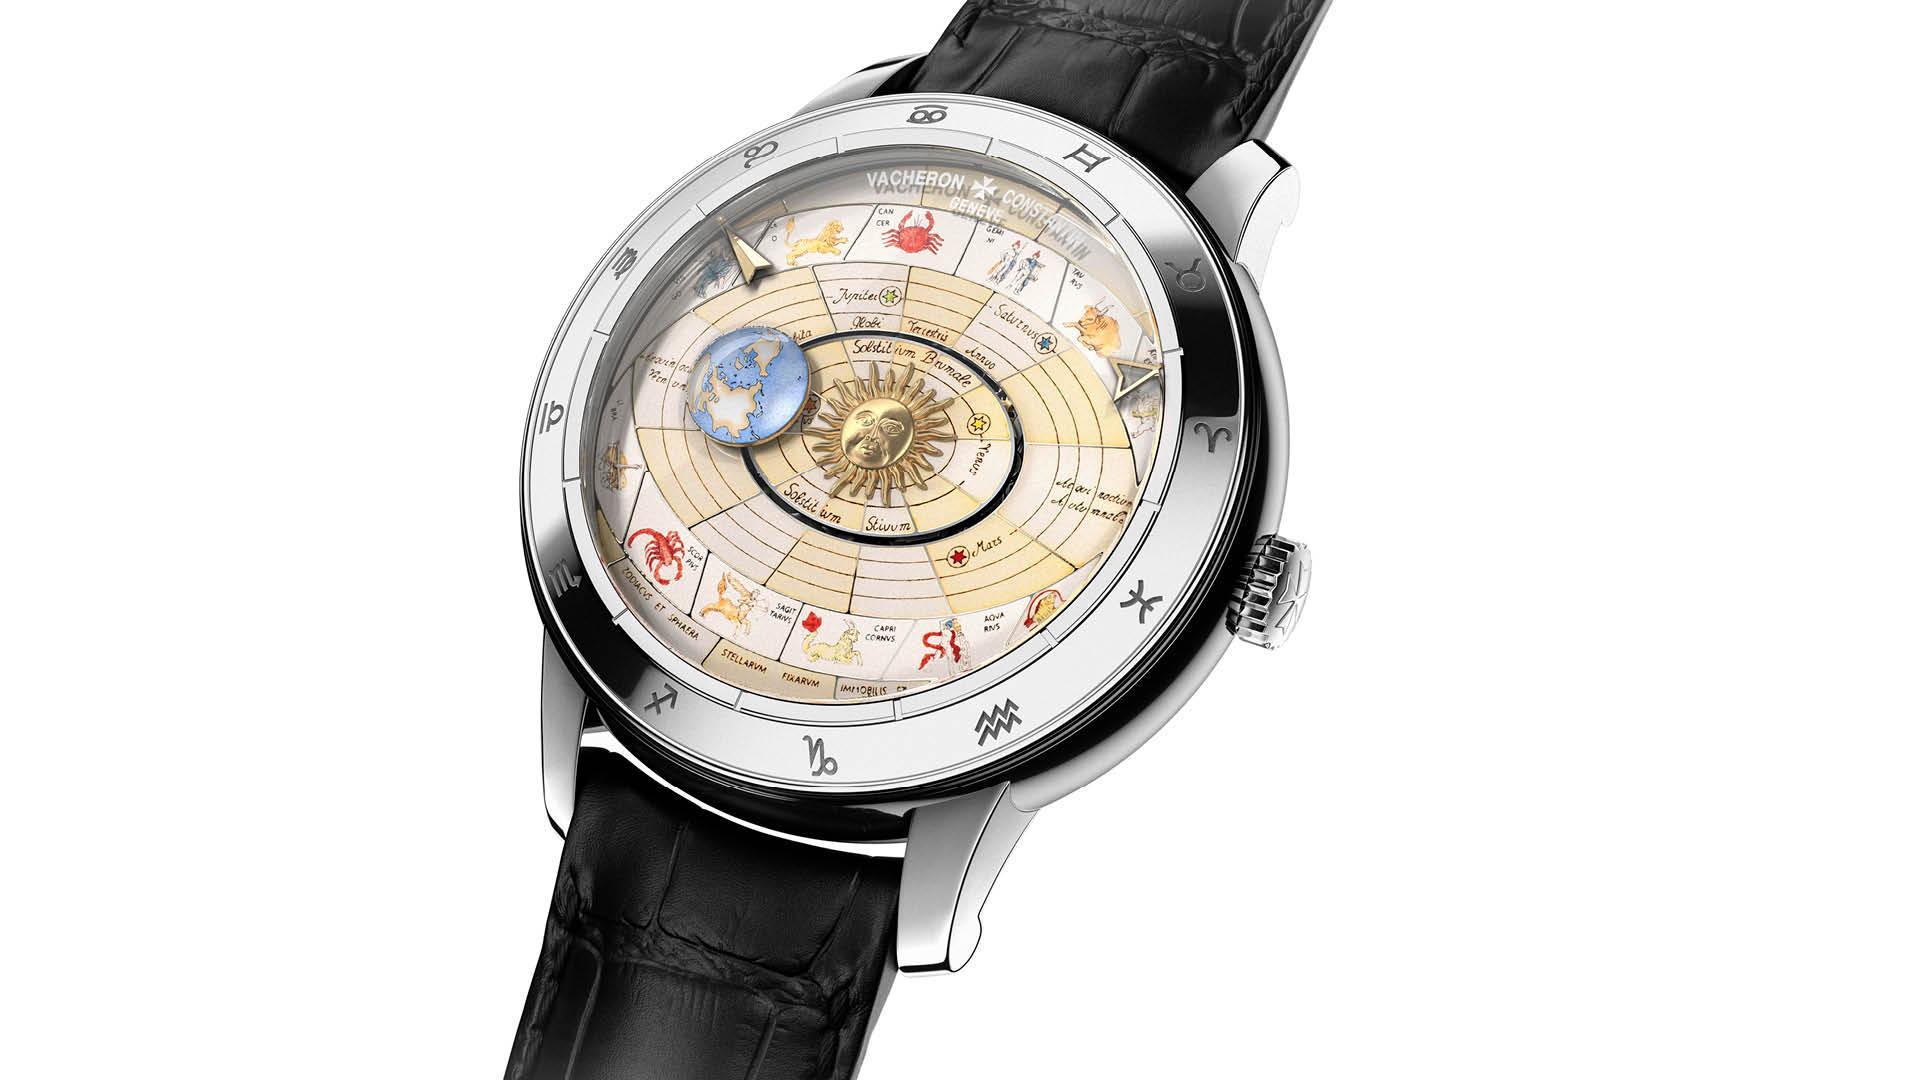 Vacheron Grand Feu Enamelled Watch